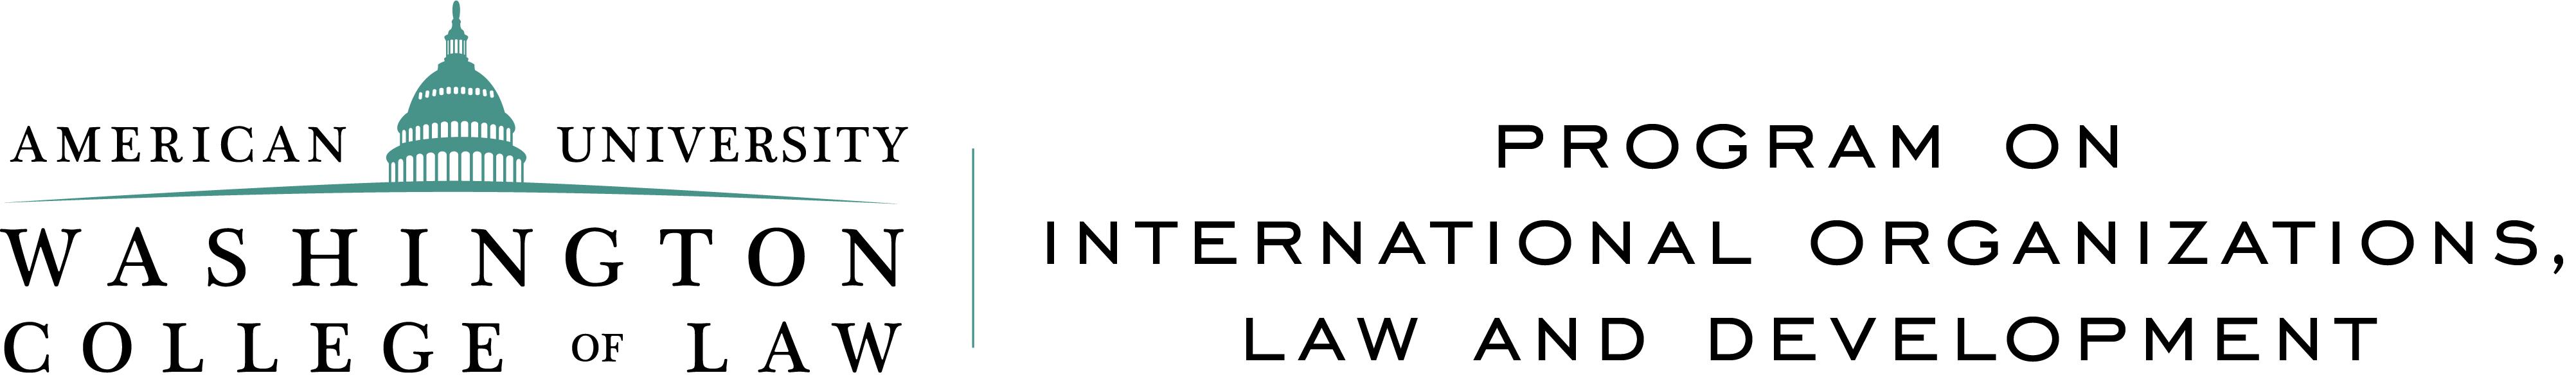 Washington college of law